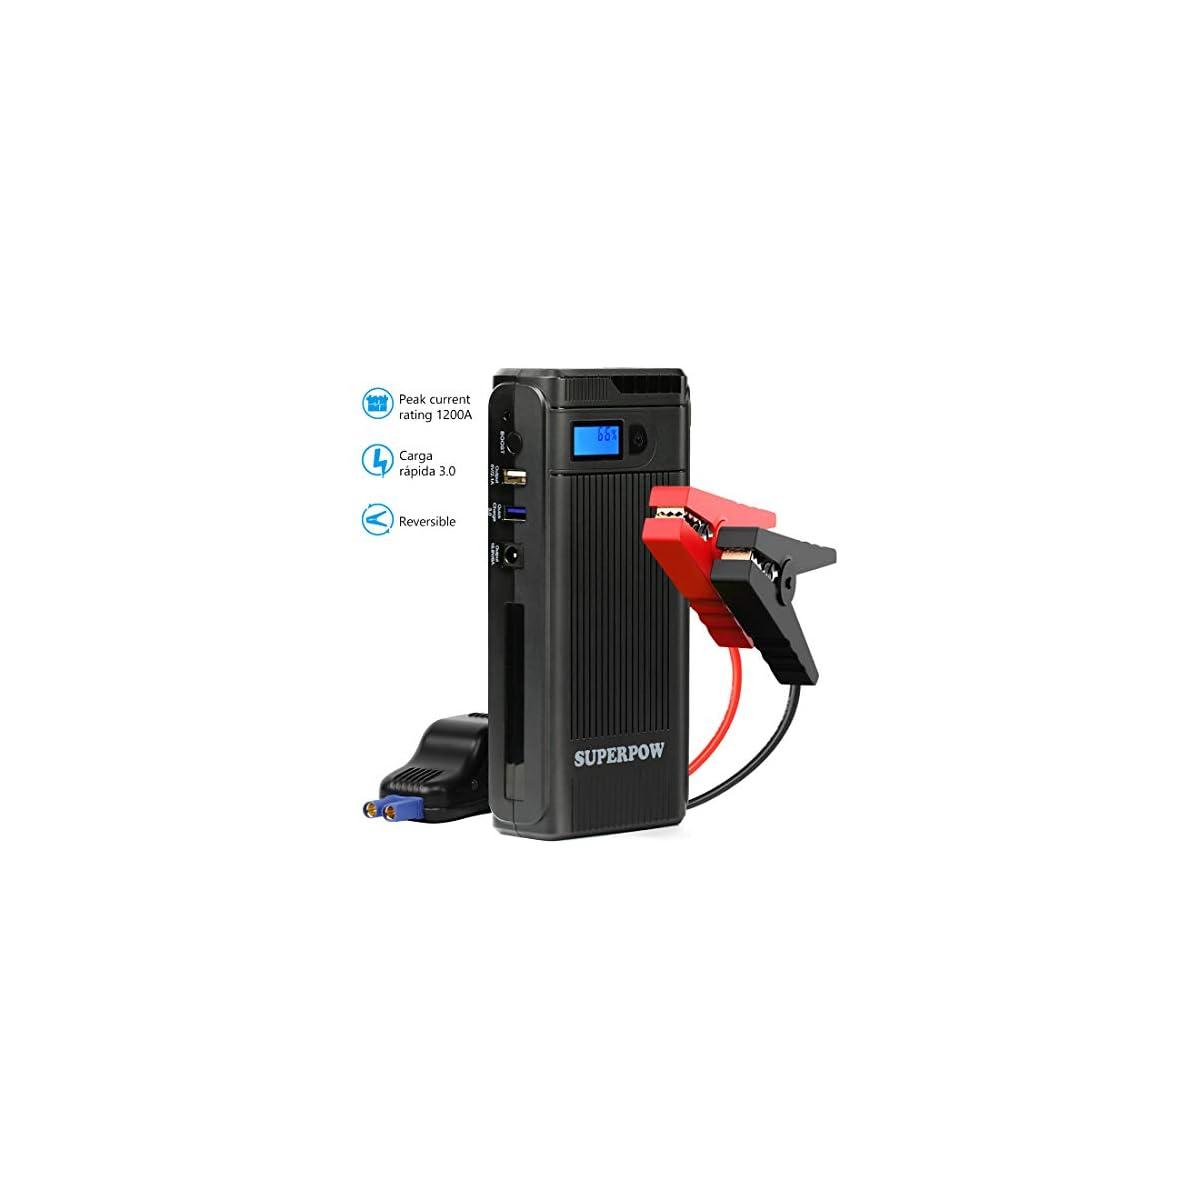 41%2BpV3RTL3L. SS1200  - Superpow Jump Starter 8000mAh, 300A Batería Arrancador de Coche (Arranque Kit para Coche, Batería Externa Portátil, Pinzas Inteligentes, LED, USB Puertos) para Emergencia Smartphones